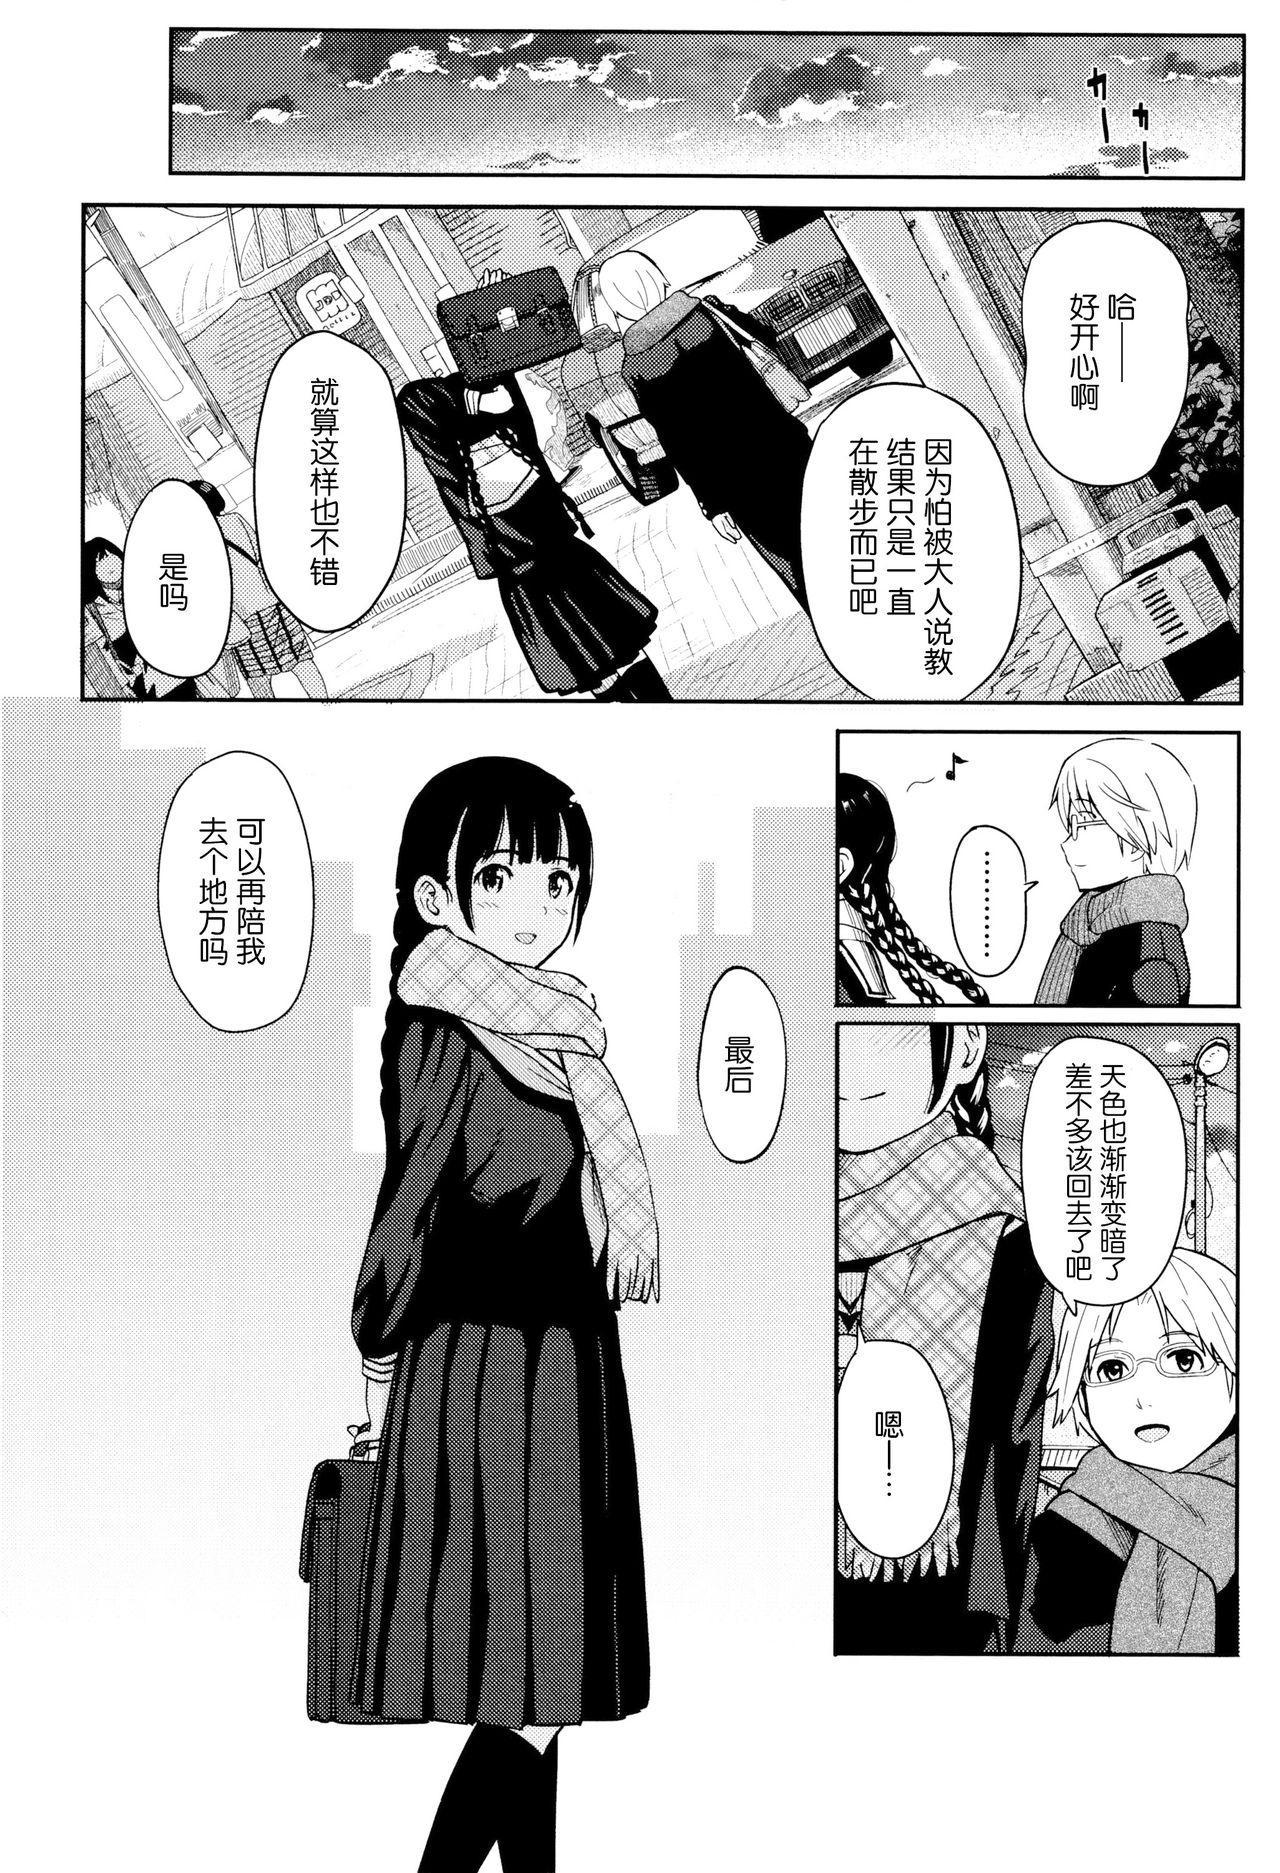 Tokubetsu na Mainichi - Special daily 98